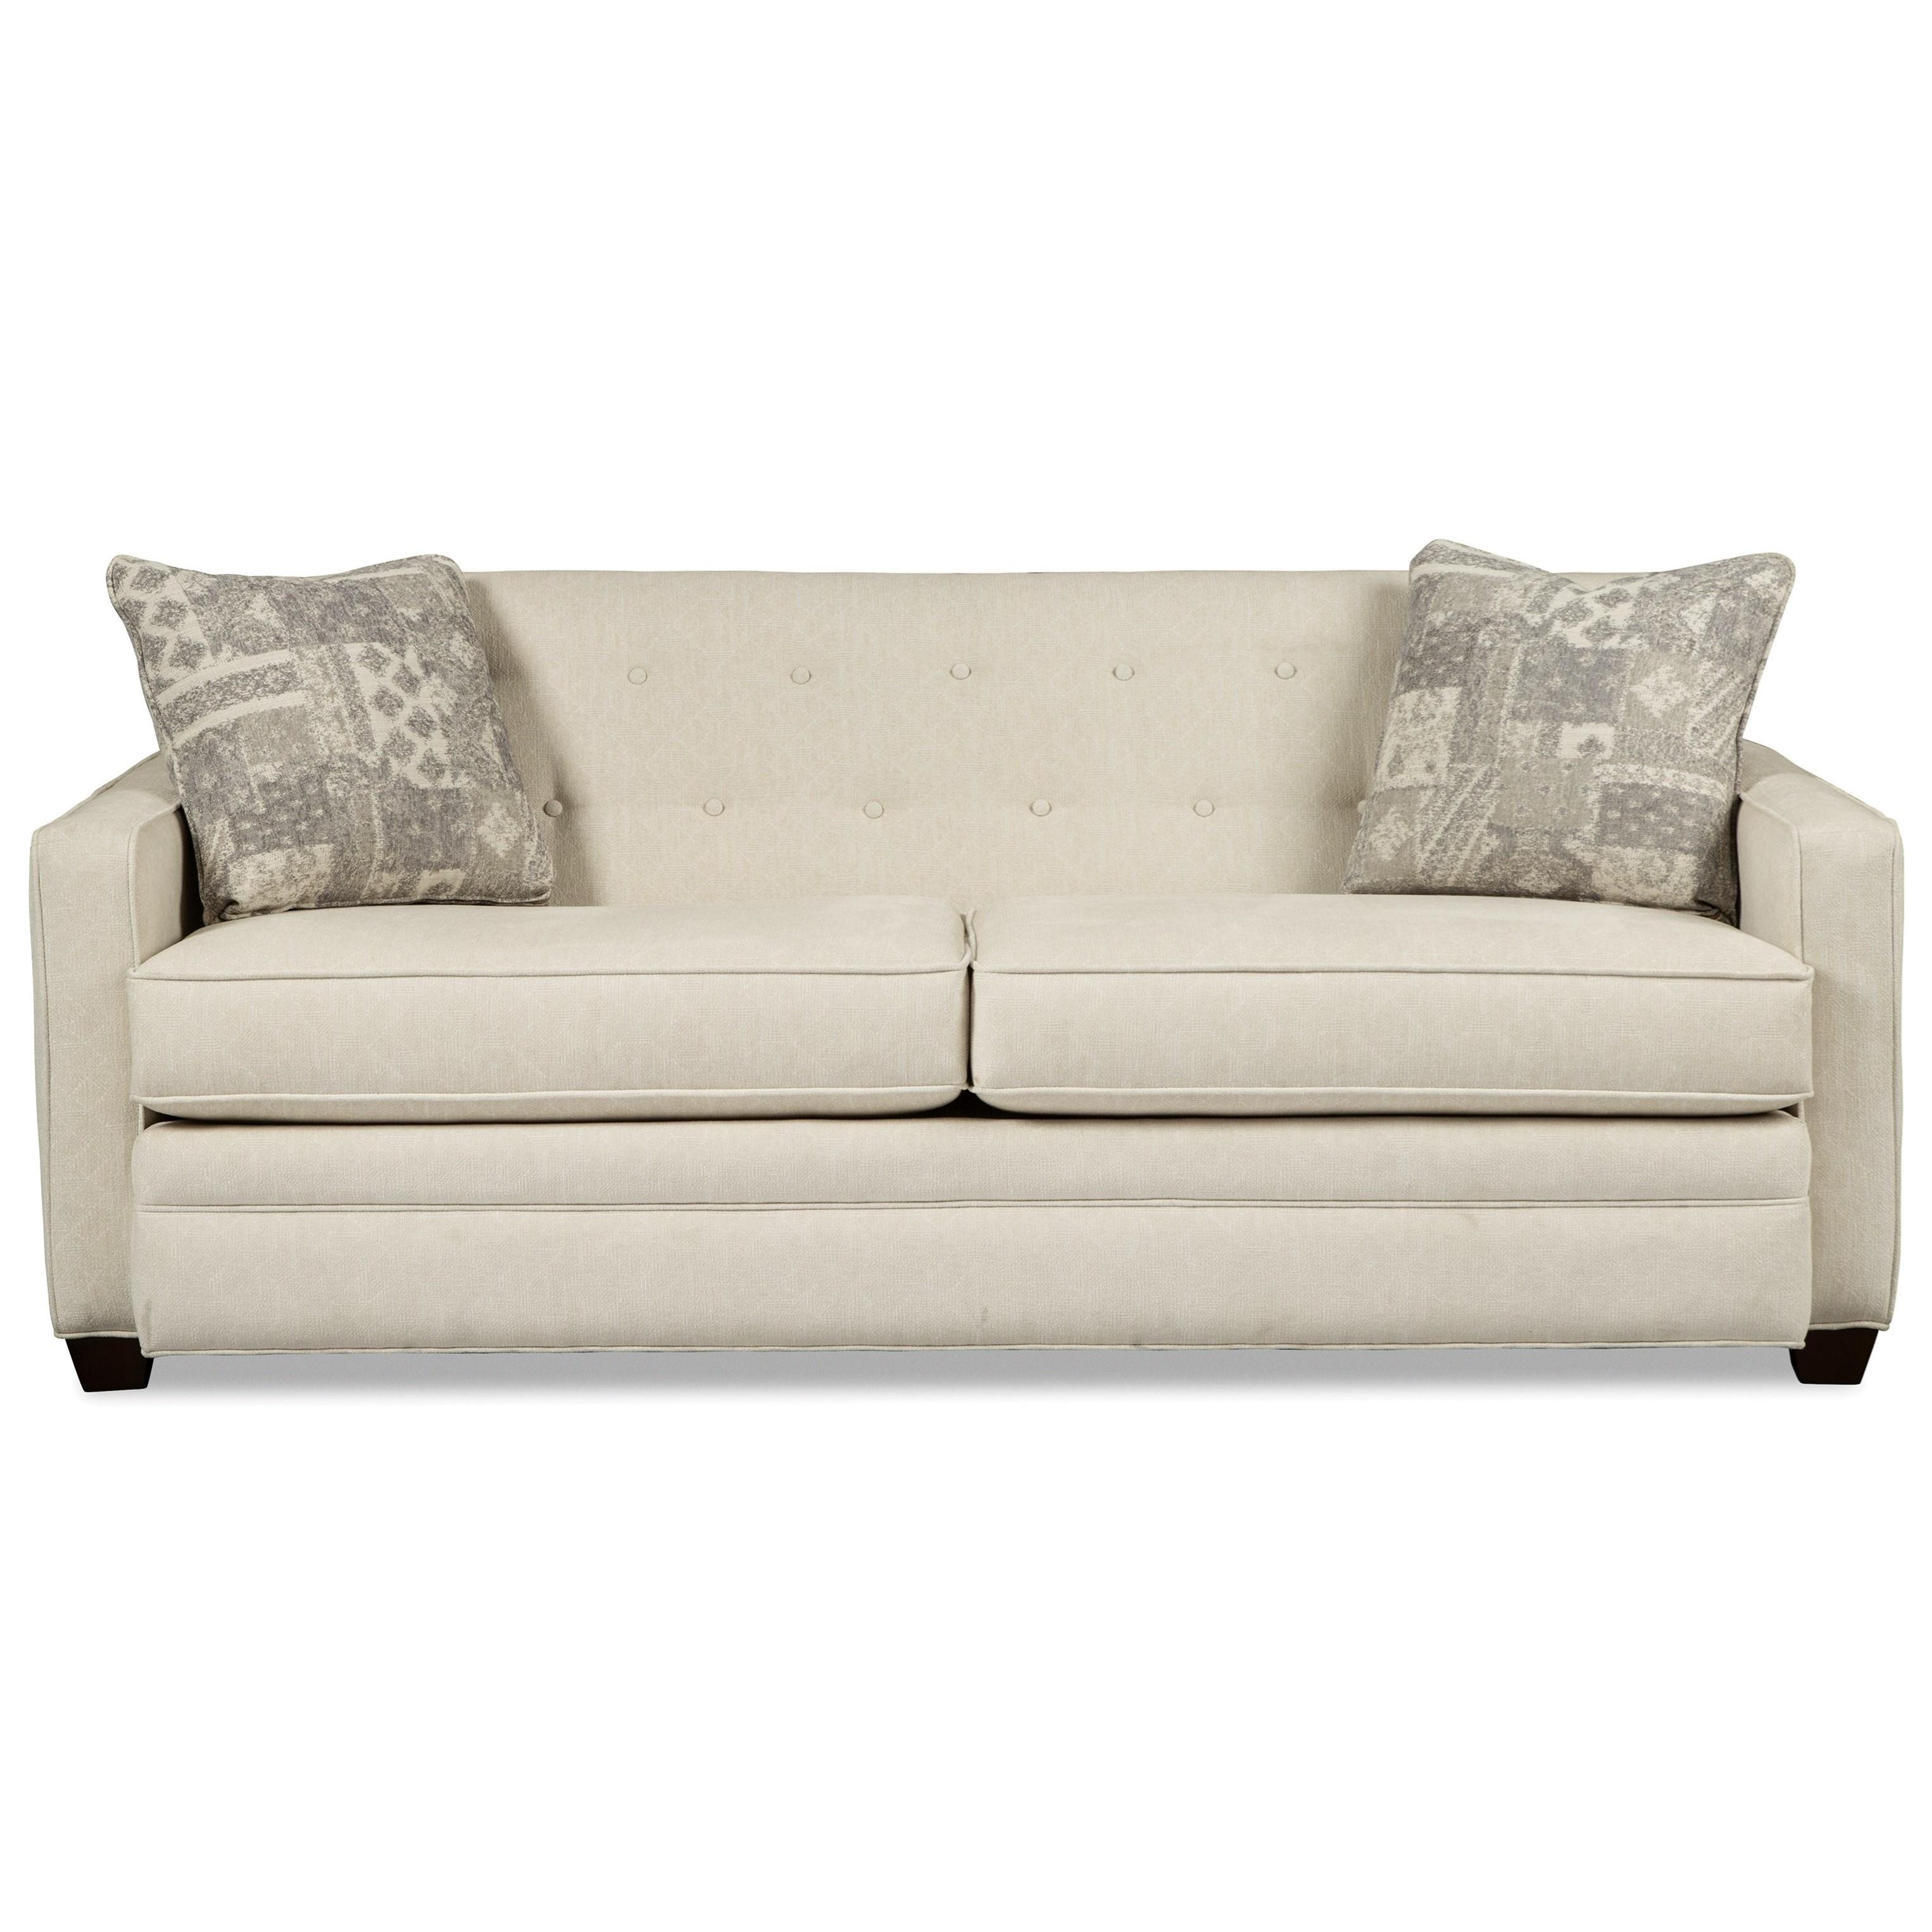 Fabulous Craftmaster 777150 Contemporary Tufted Sofa Belfort Machost Co Dining Chair Design Ideas Machostcouk